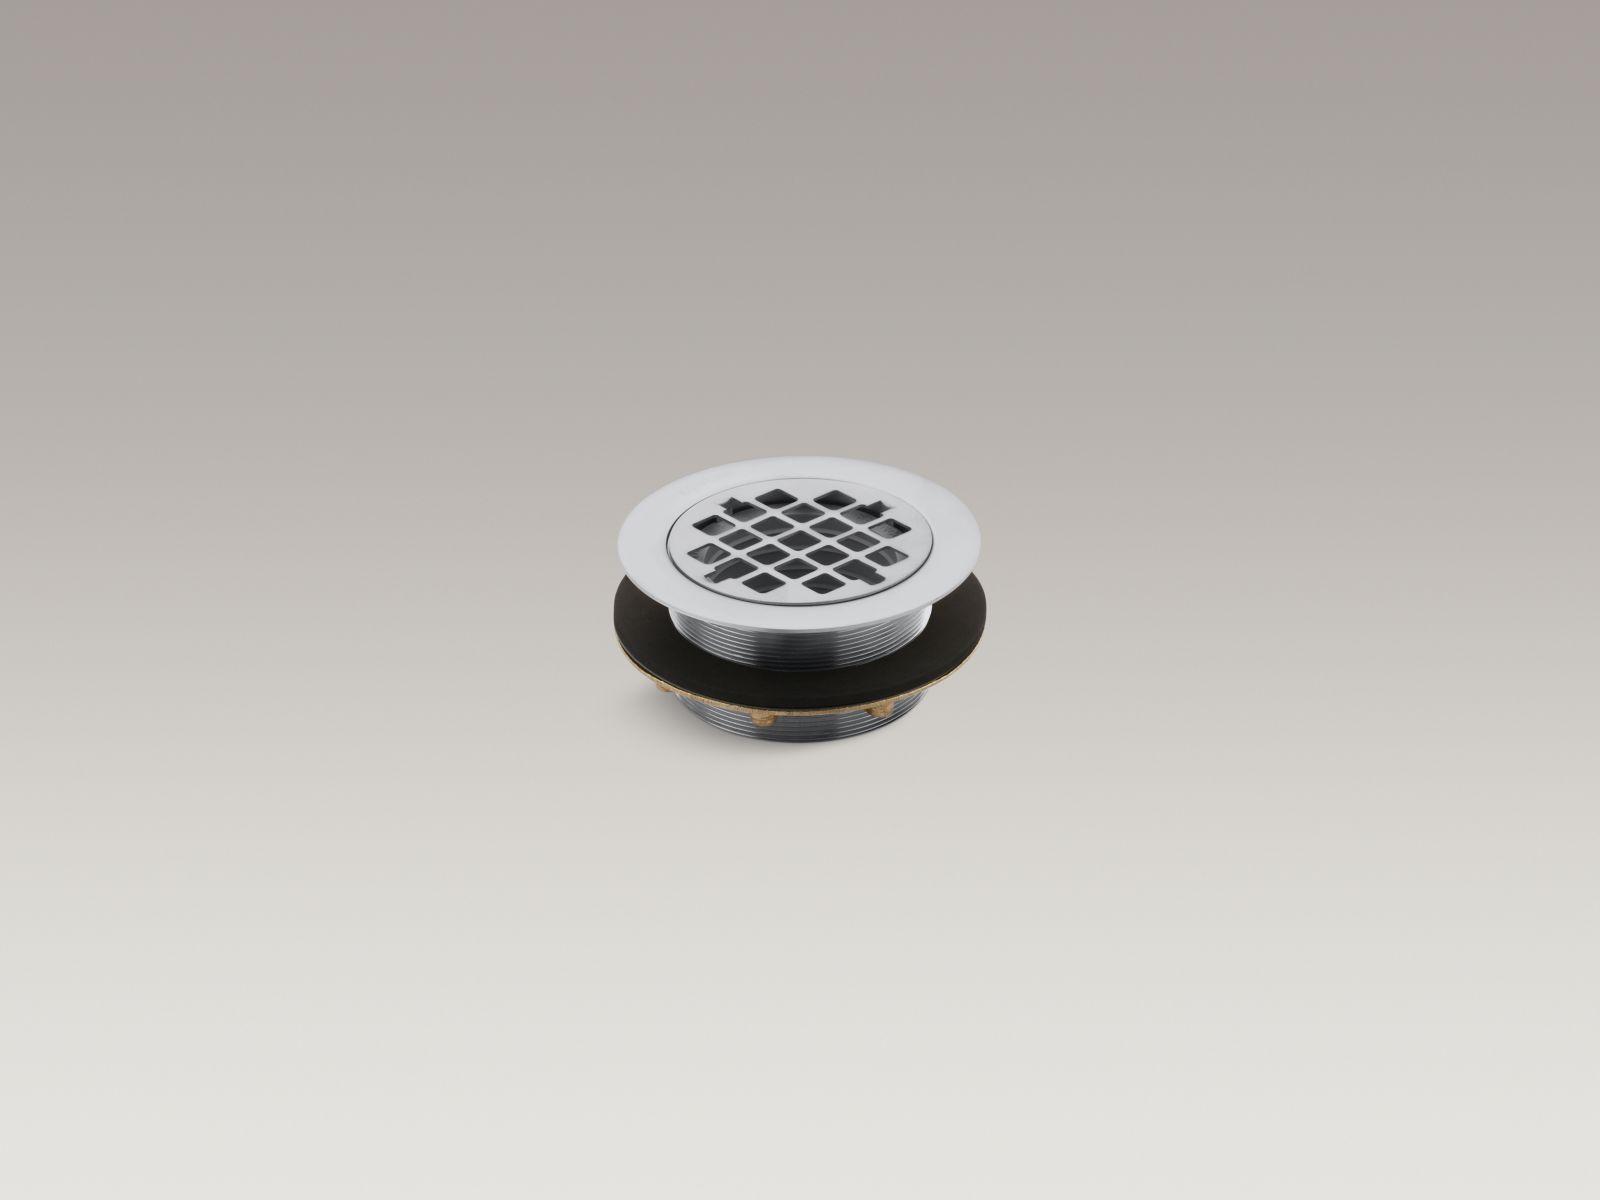 Kohler K-9132-G Round Shower Base Drain with Plastic Pipe Gasket Brushed Chrome